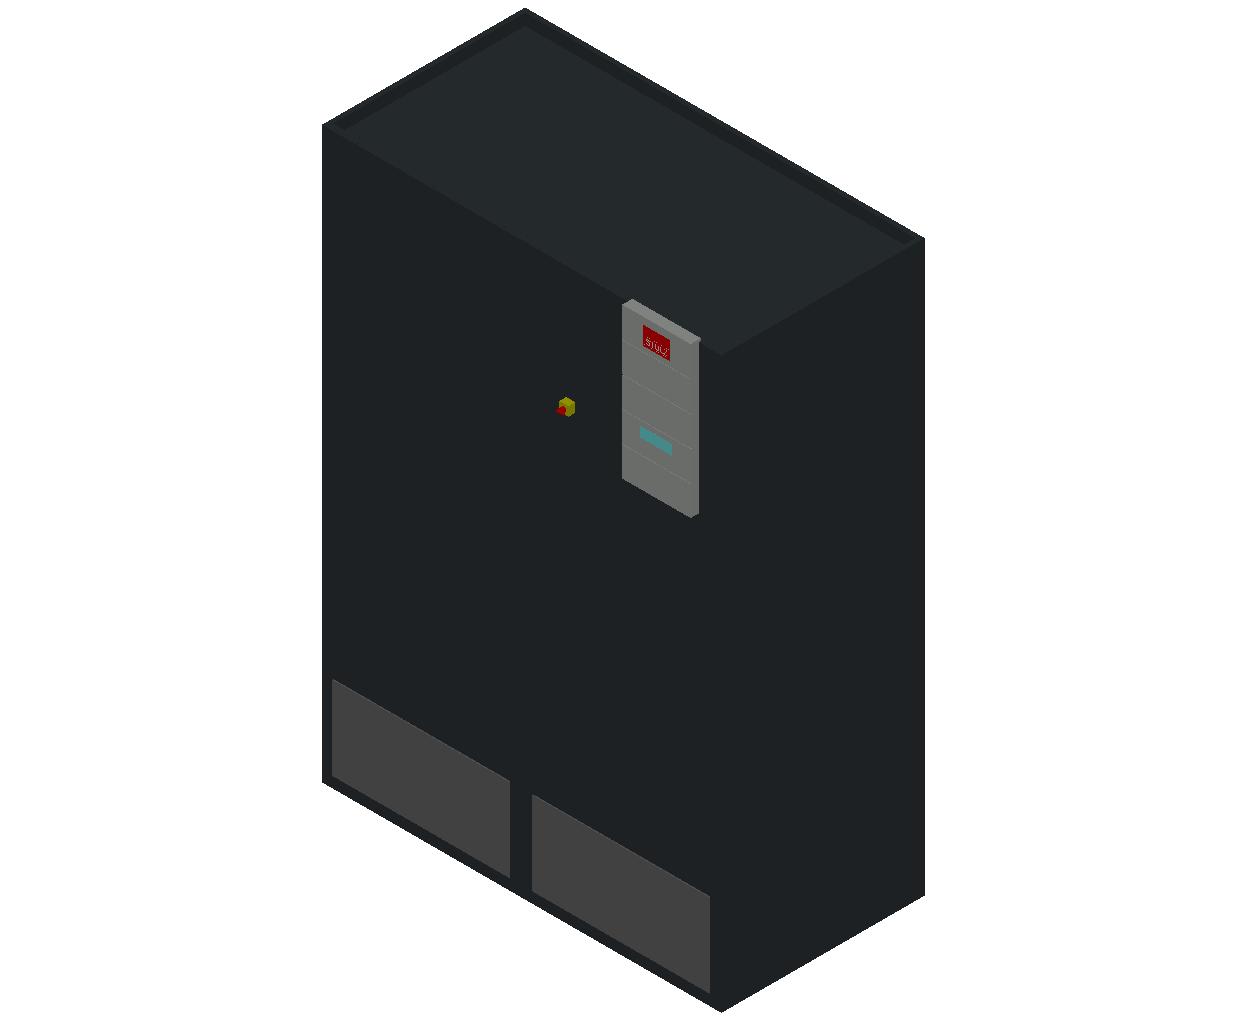 HC_Air Conditioner_Indoor Unit_MEPcontent_STULZ_CyberAir 3PRO_ASR_Dual Circuit A_ASR_602_A_INT-EN.dwg